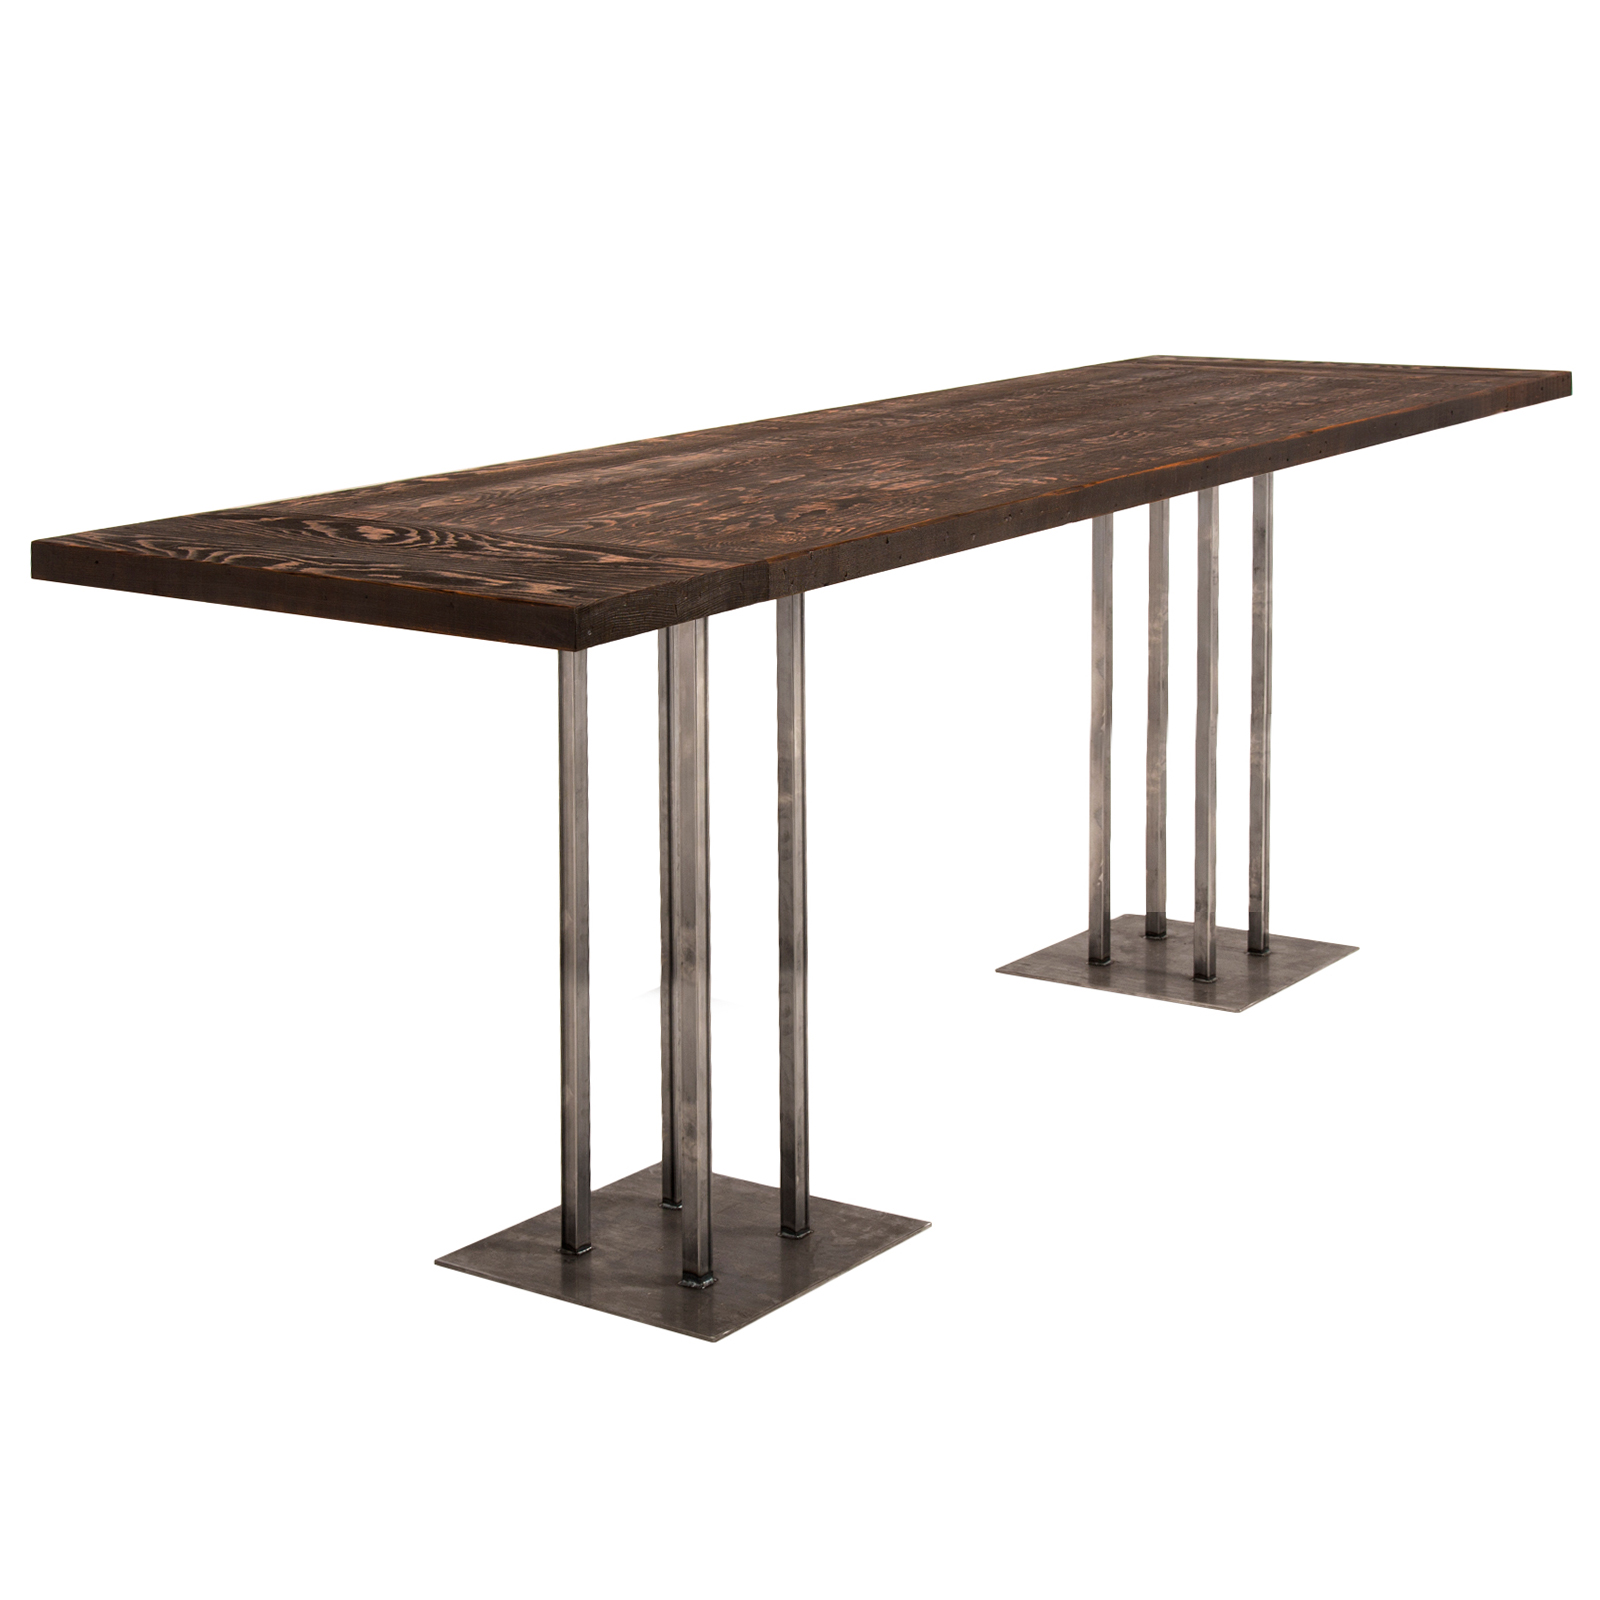 Rustic bar table rentals event furniture rental delivery